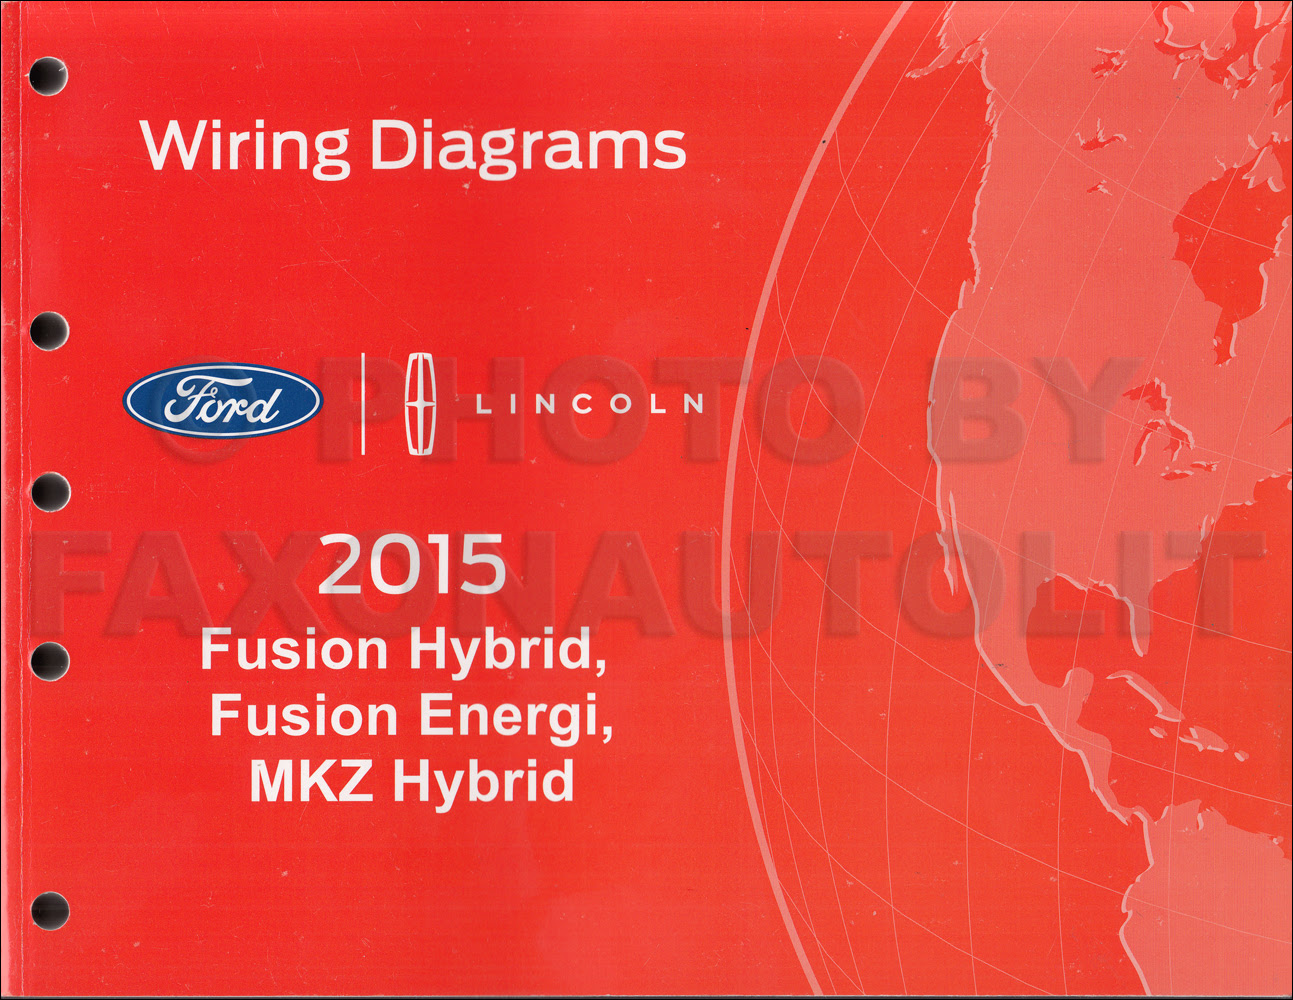 Diagram 2014 Ford Fusion Hybrid Energi Lincoln Mkz Hyb Electrical Wiring Diagram Manual Full Version Hd Quality Diagram Manual Anawiringx18 Locandadossello It